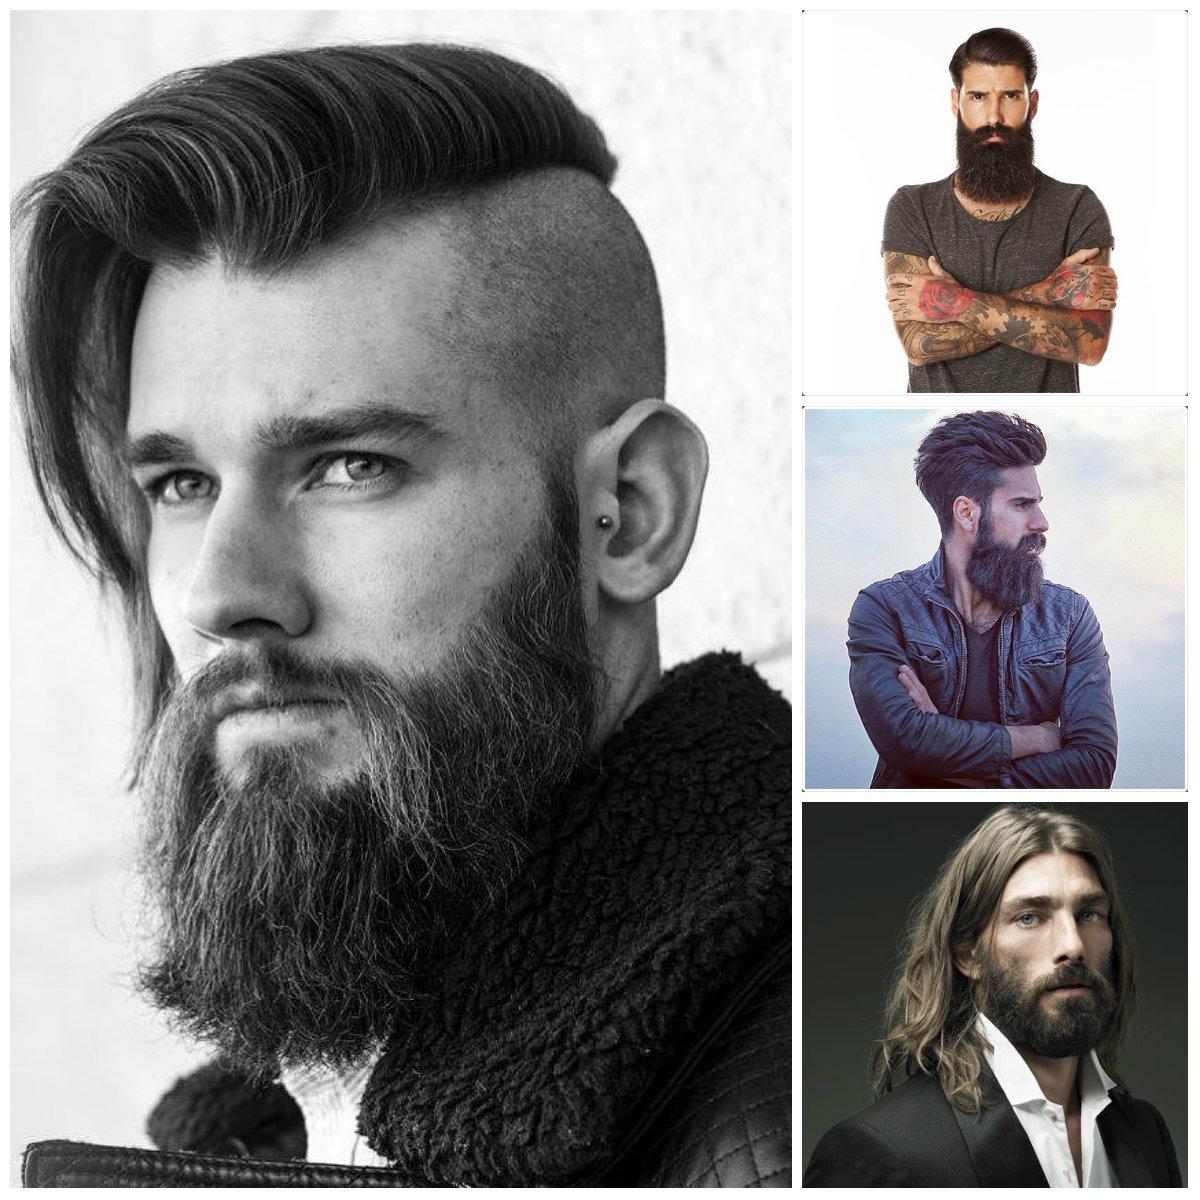 peinados modernos para hombre con la barba larga 2016